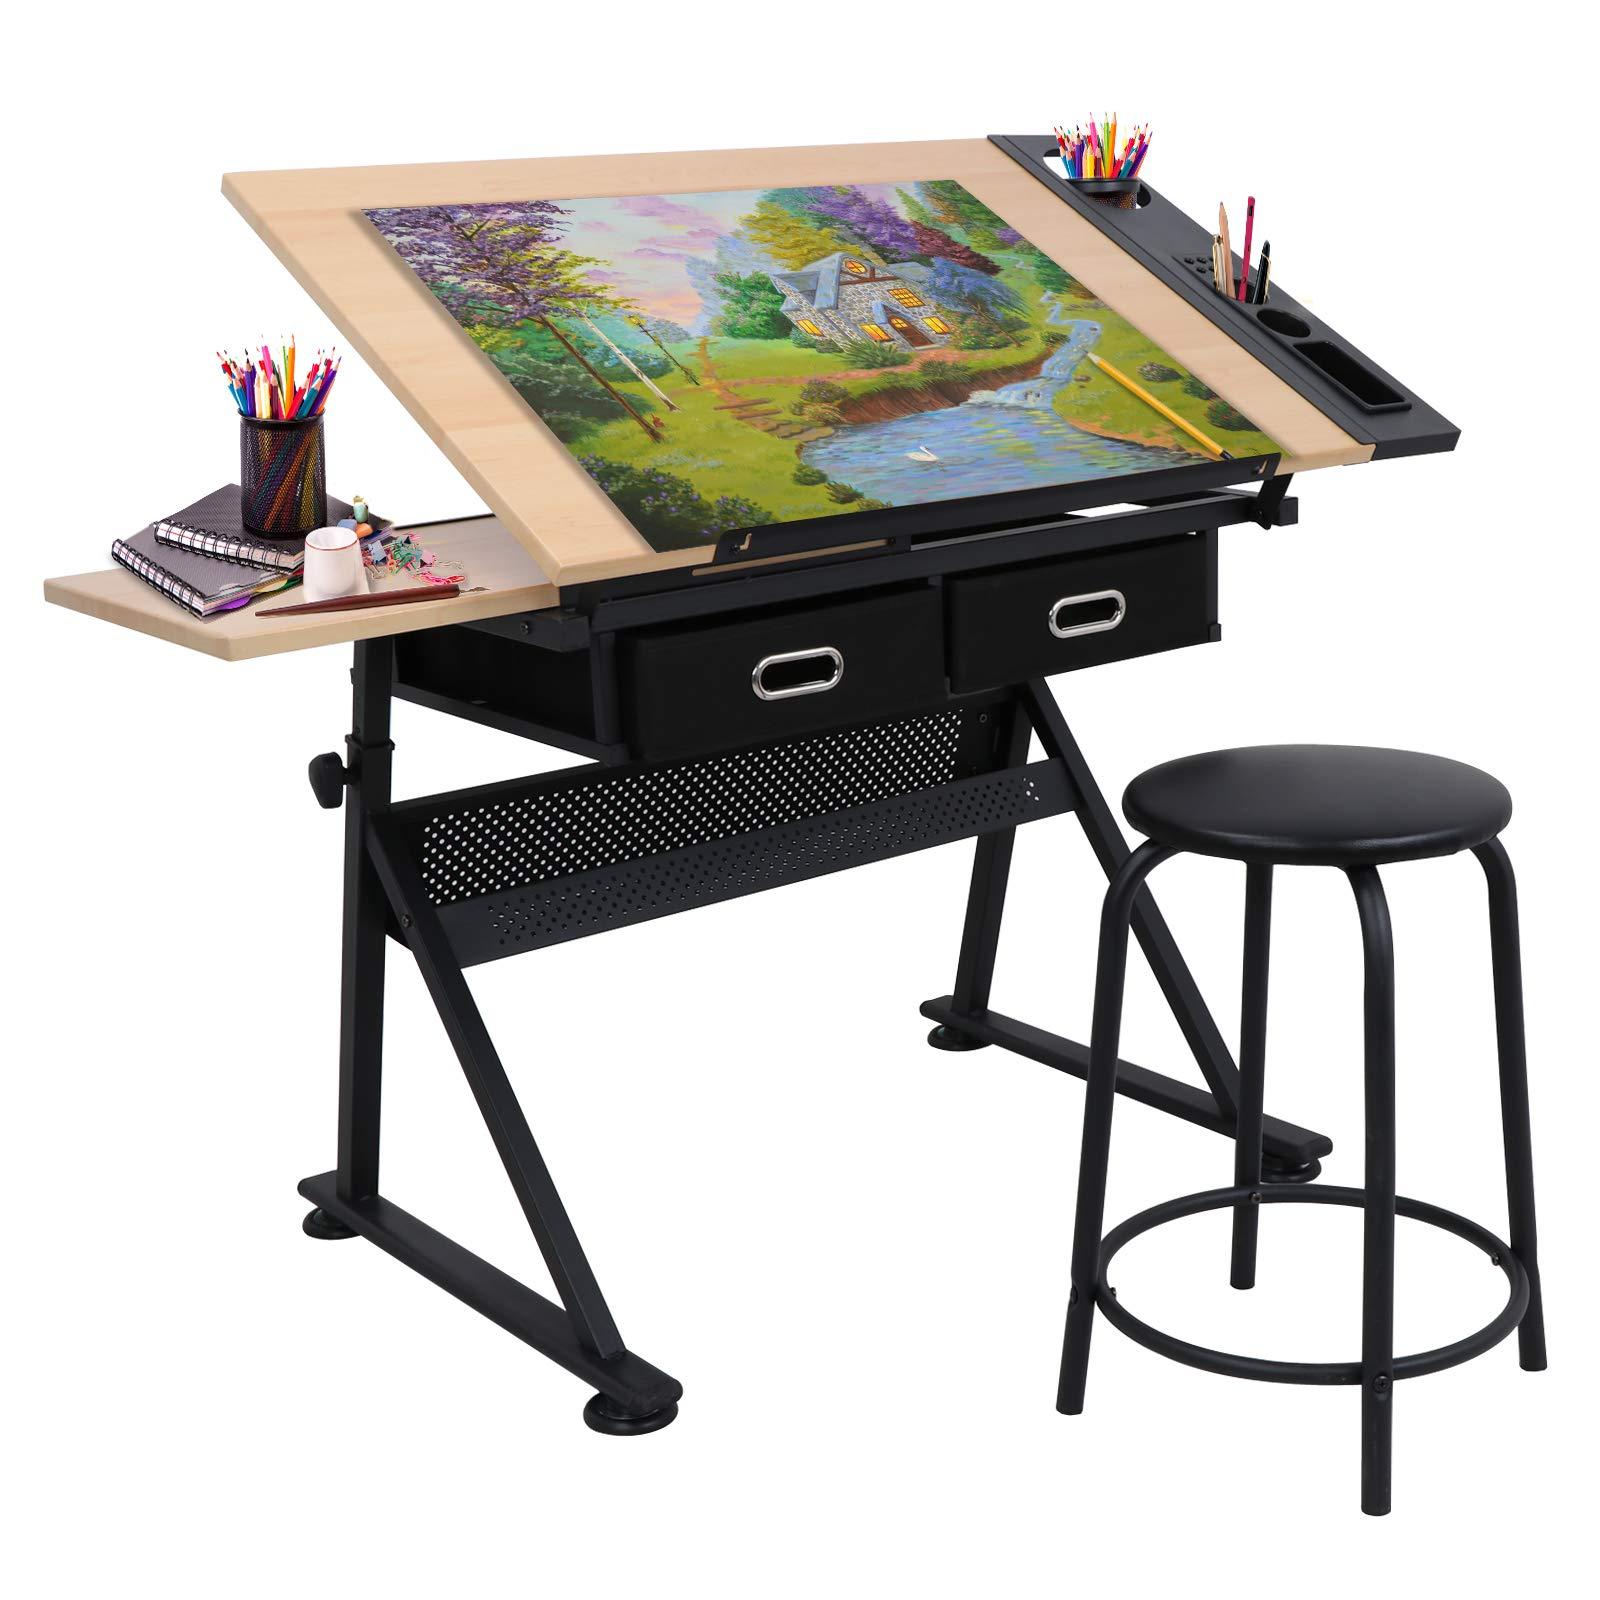 Adjustable Drafting Drawing Tiltable Tabletop